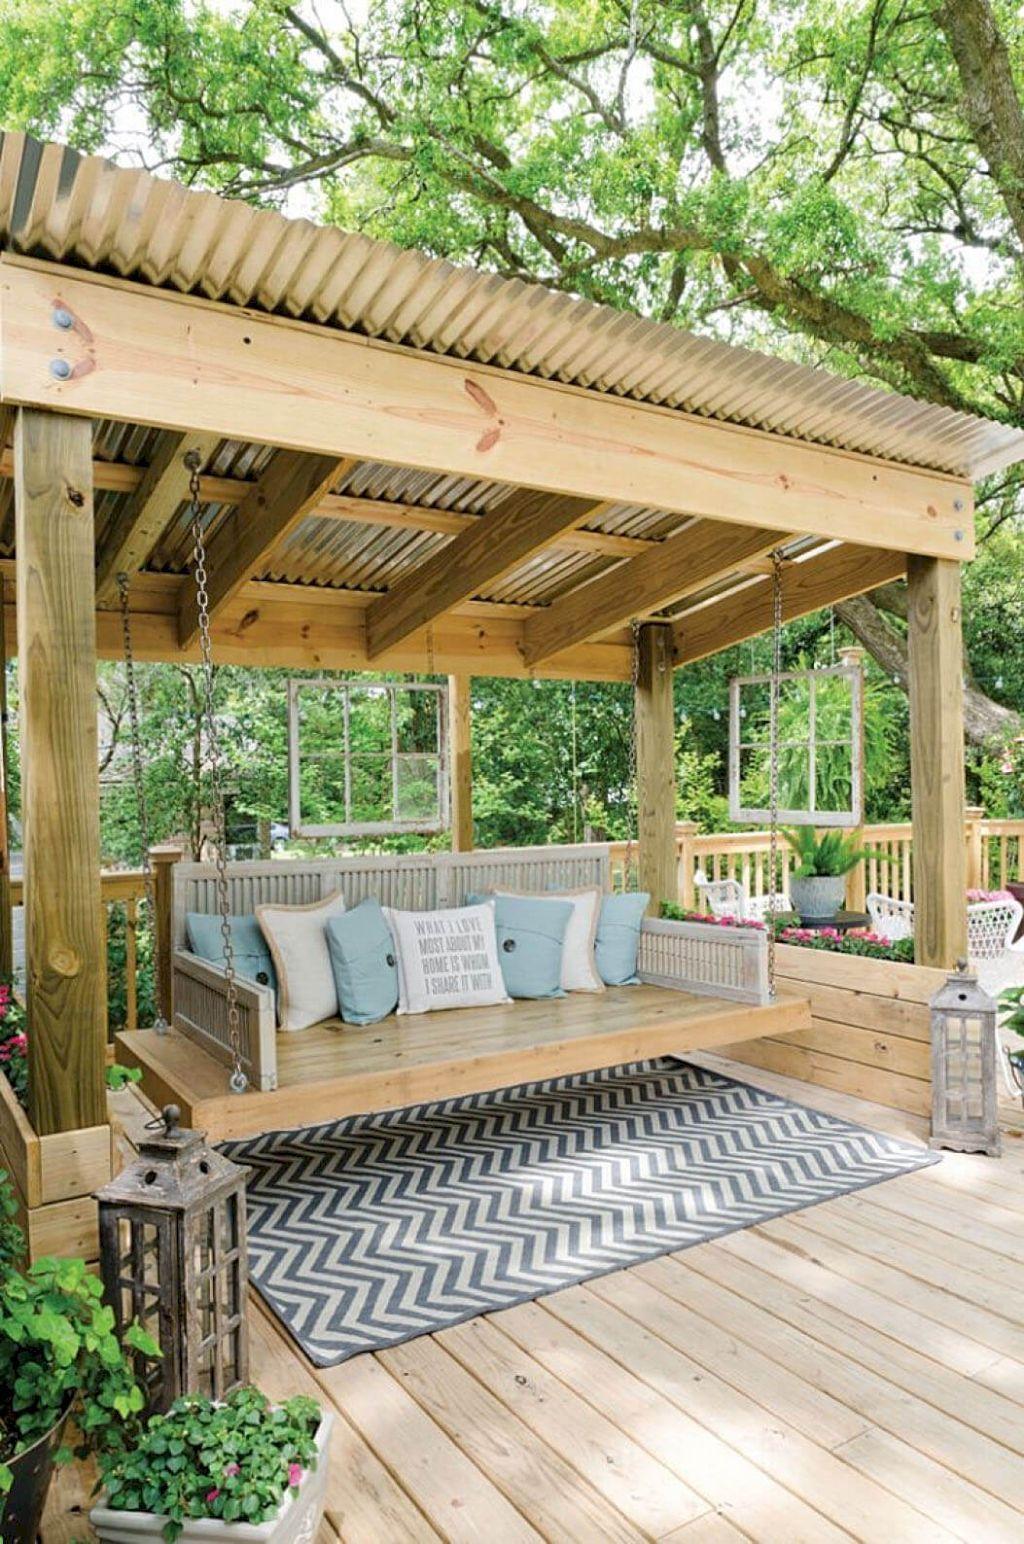 40 Beautiful Backyard Patio Design Ideas | Outdoor Space | Pinterest ...